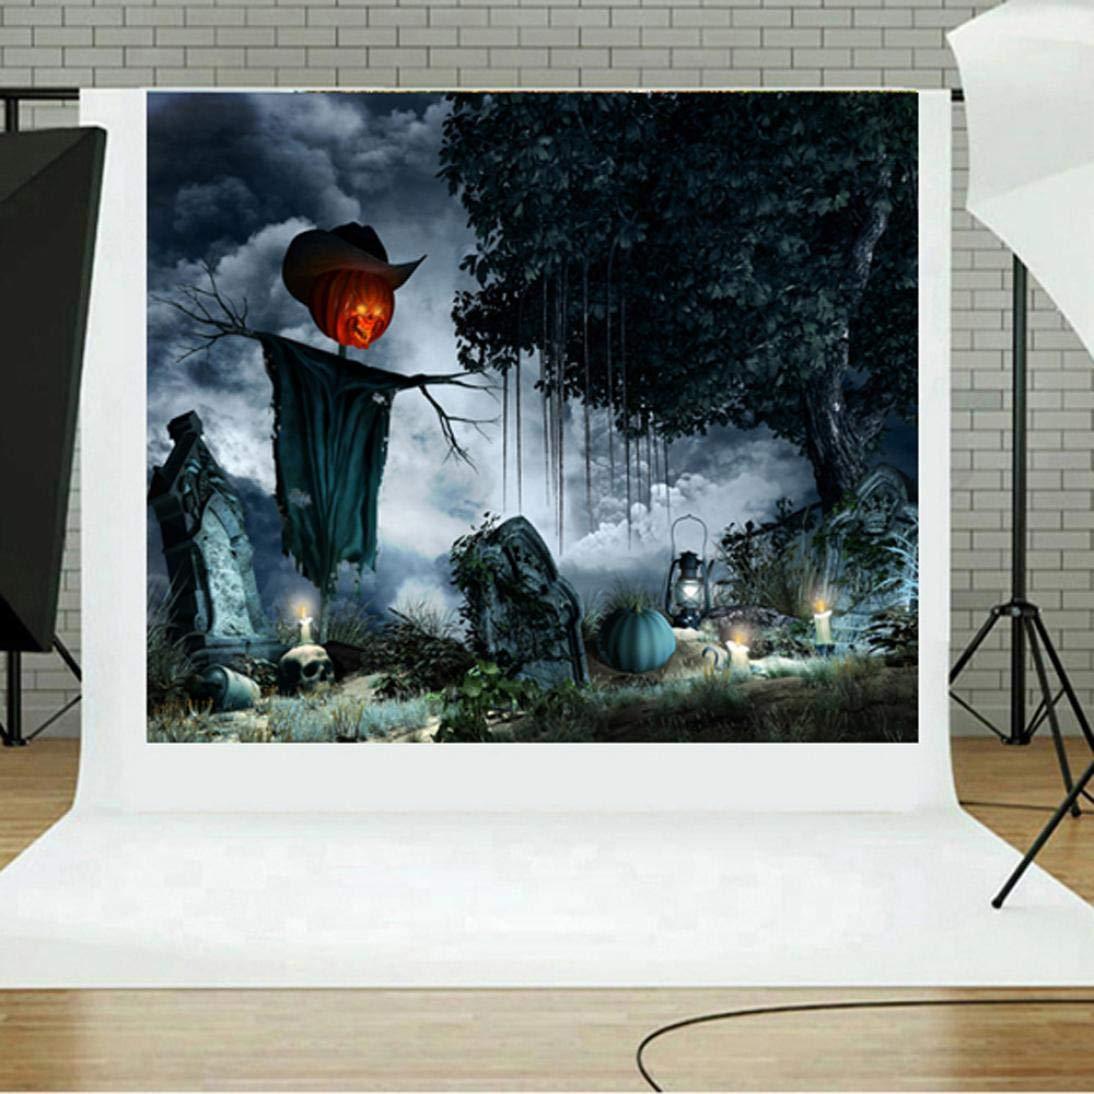 Waymine ハロウィン 背景幕 パンプキン ビニール 3x5フィート 暖炉 写真 黒板背景 子供のパーティー写真スタジオ小道具 ブラック Way32467  E B07GJKZ5QB